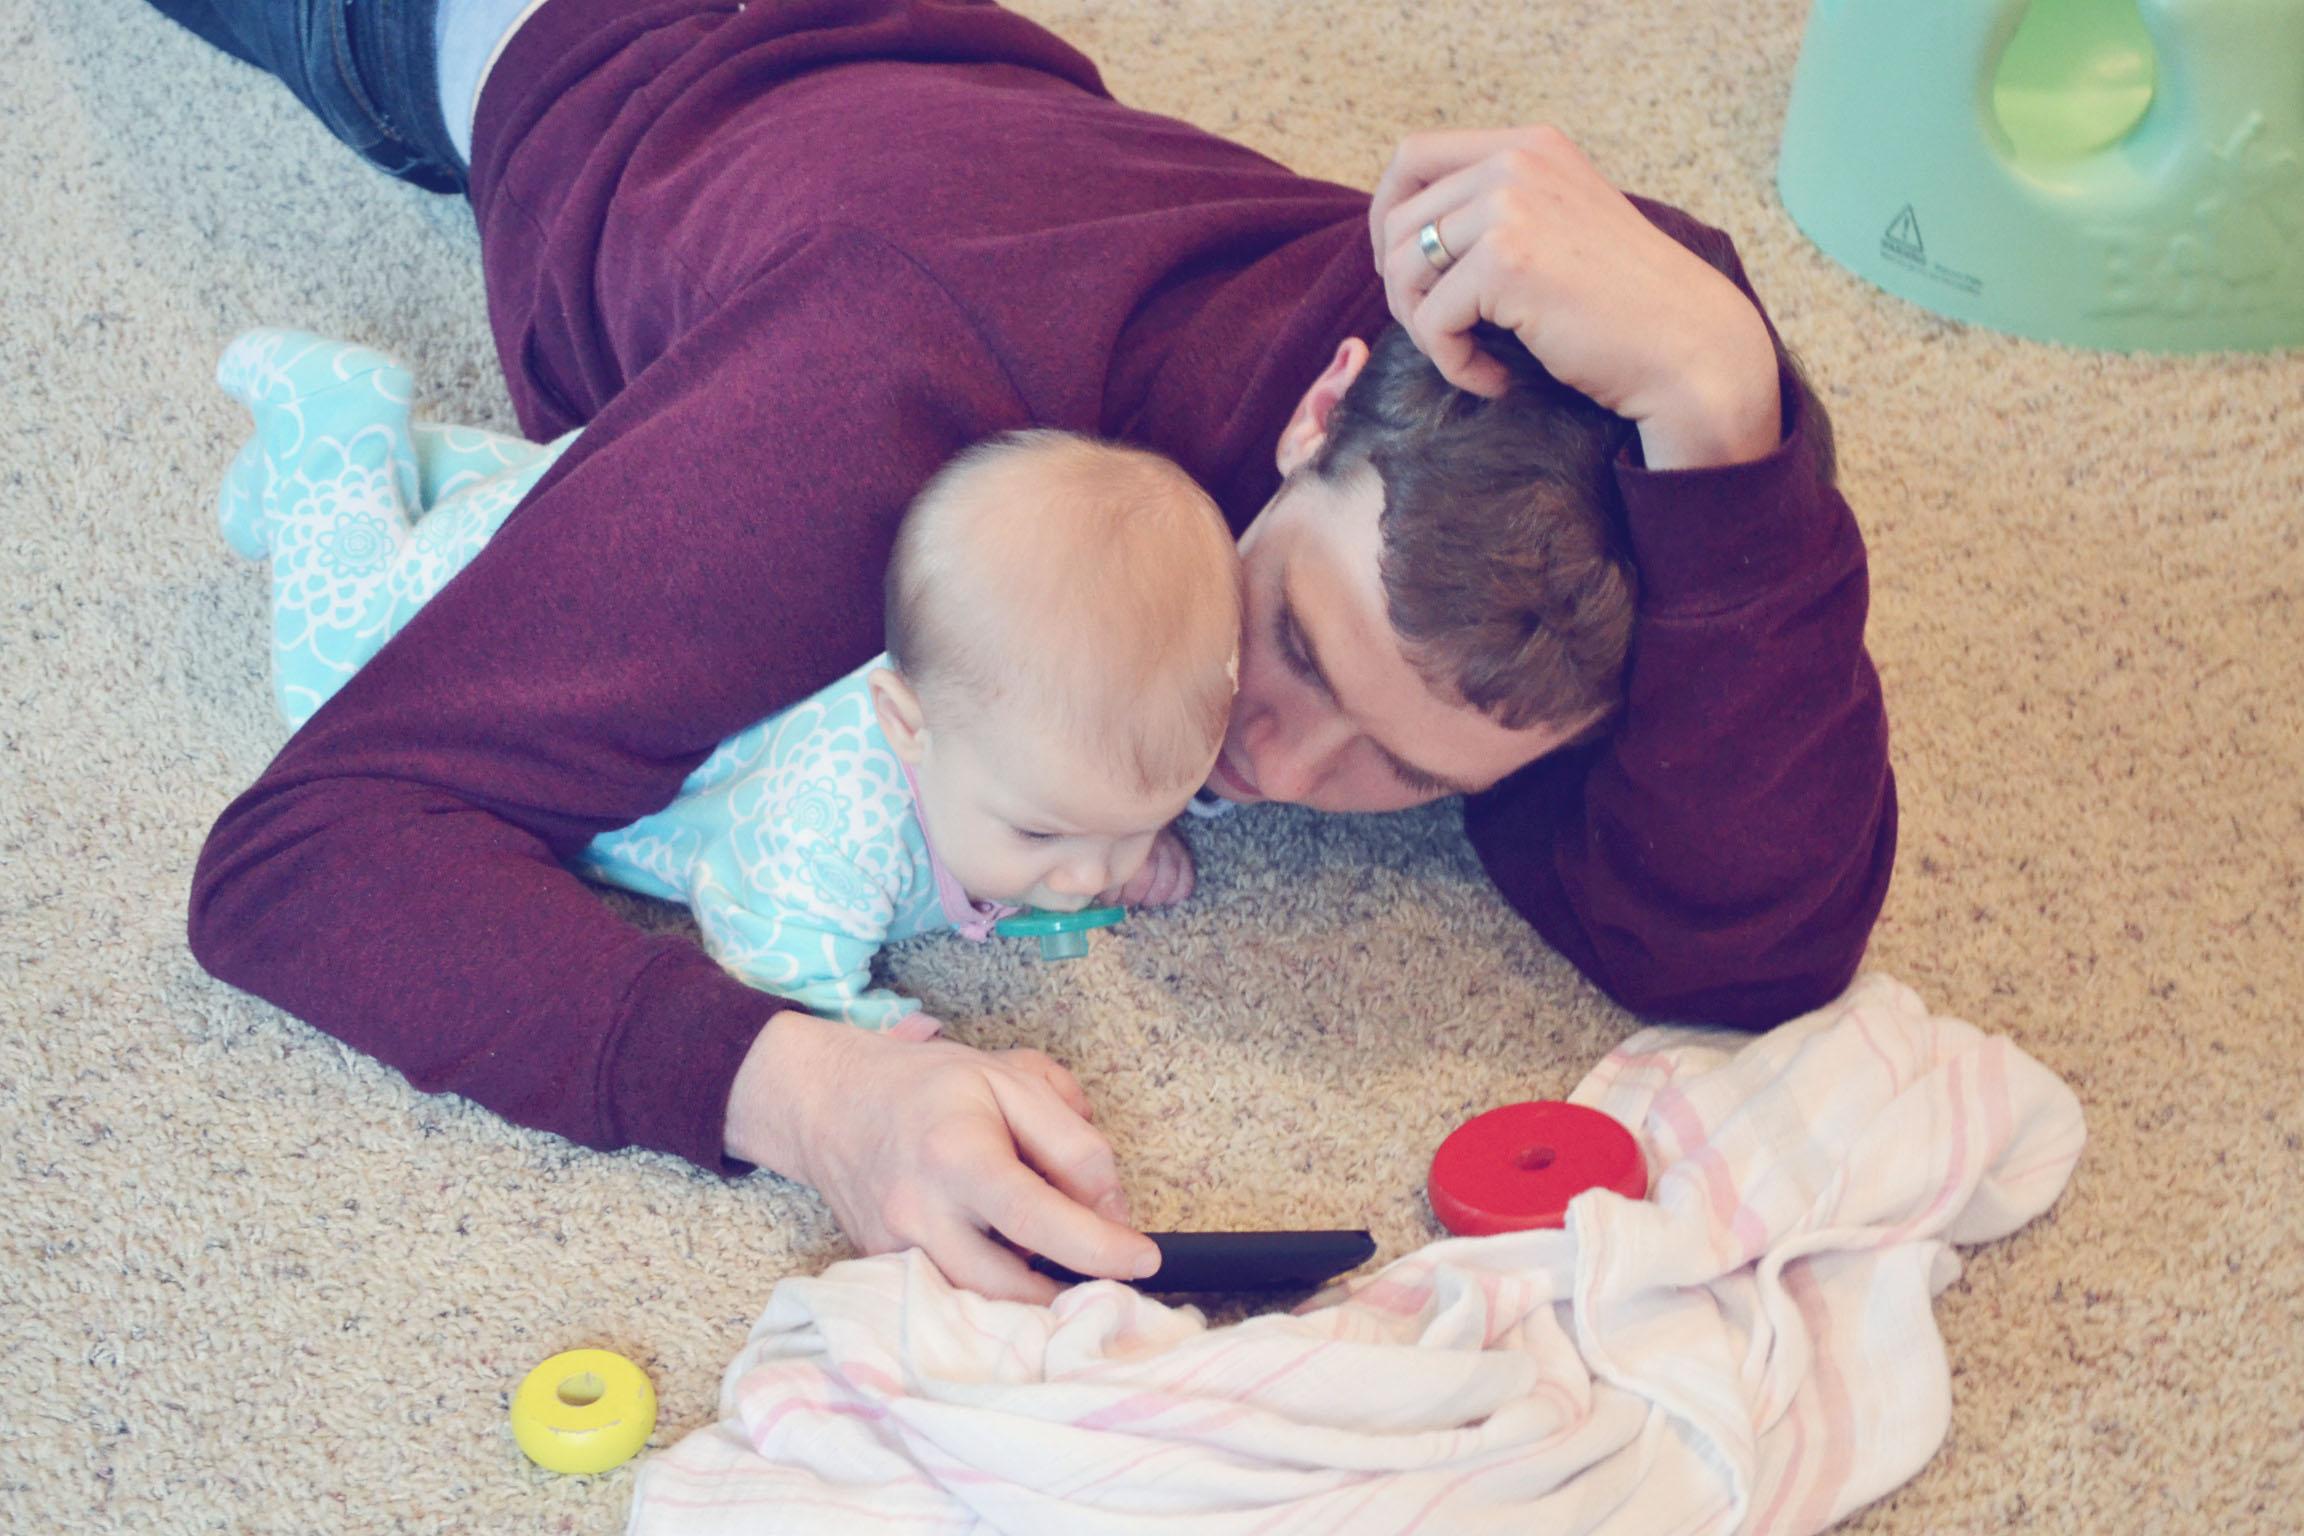 tata se igra sa bebom